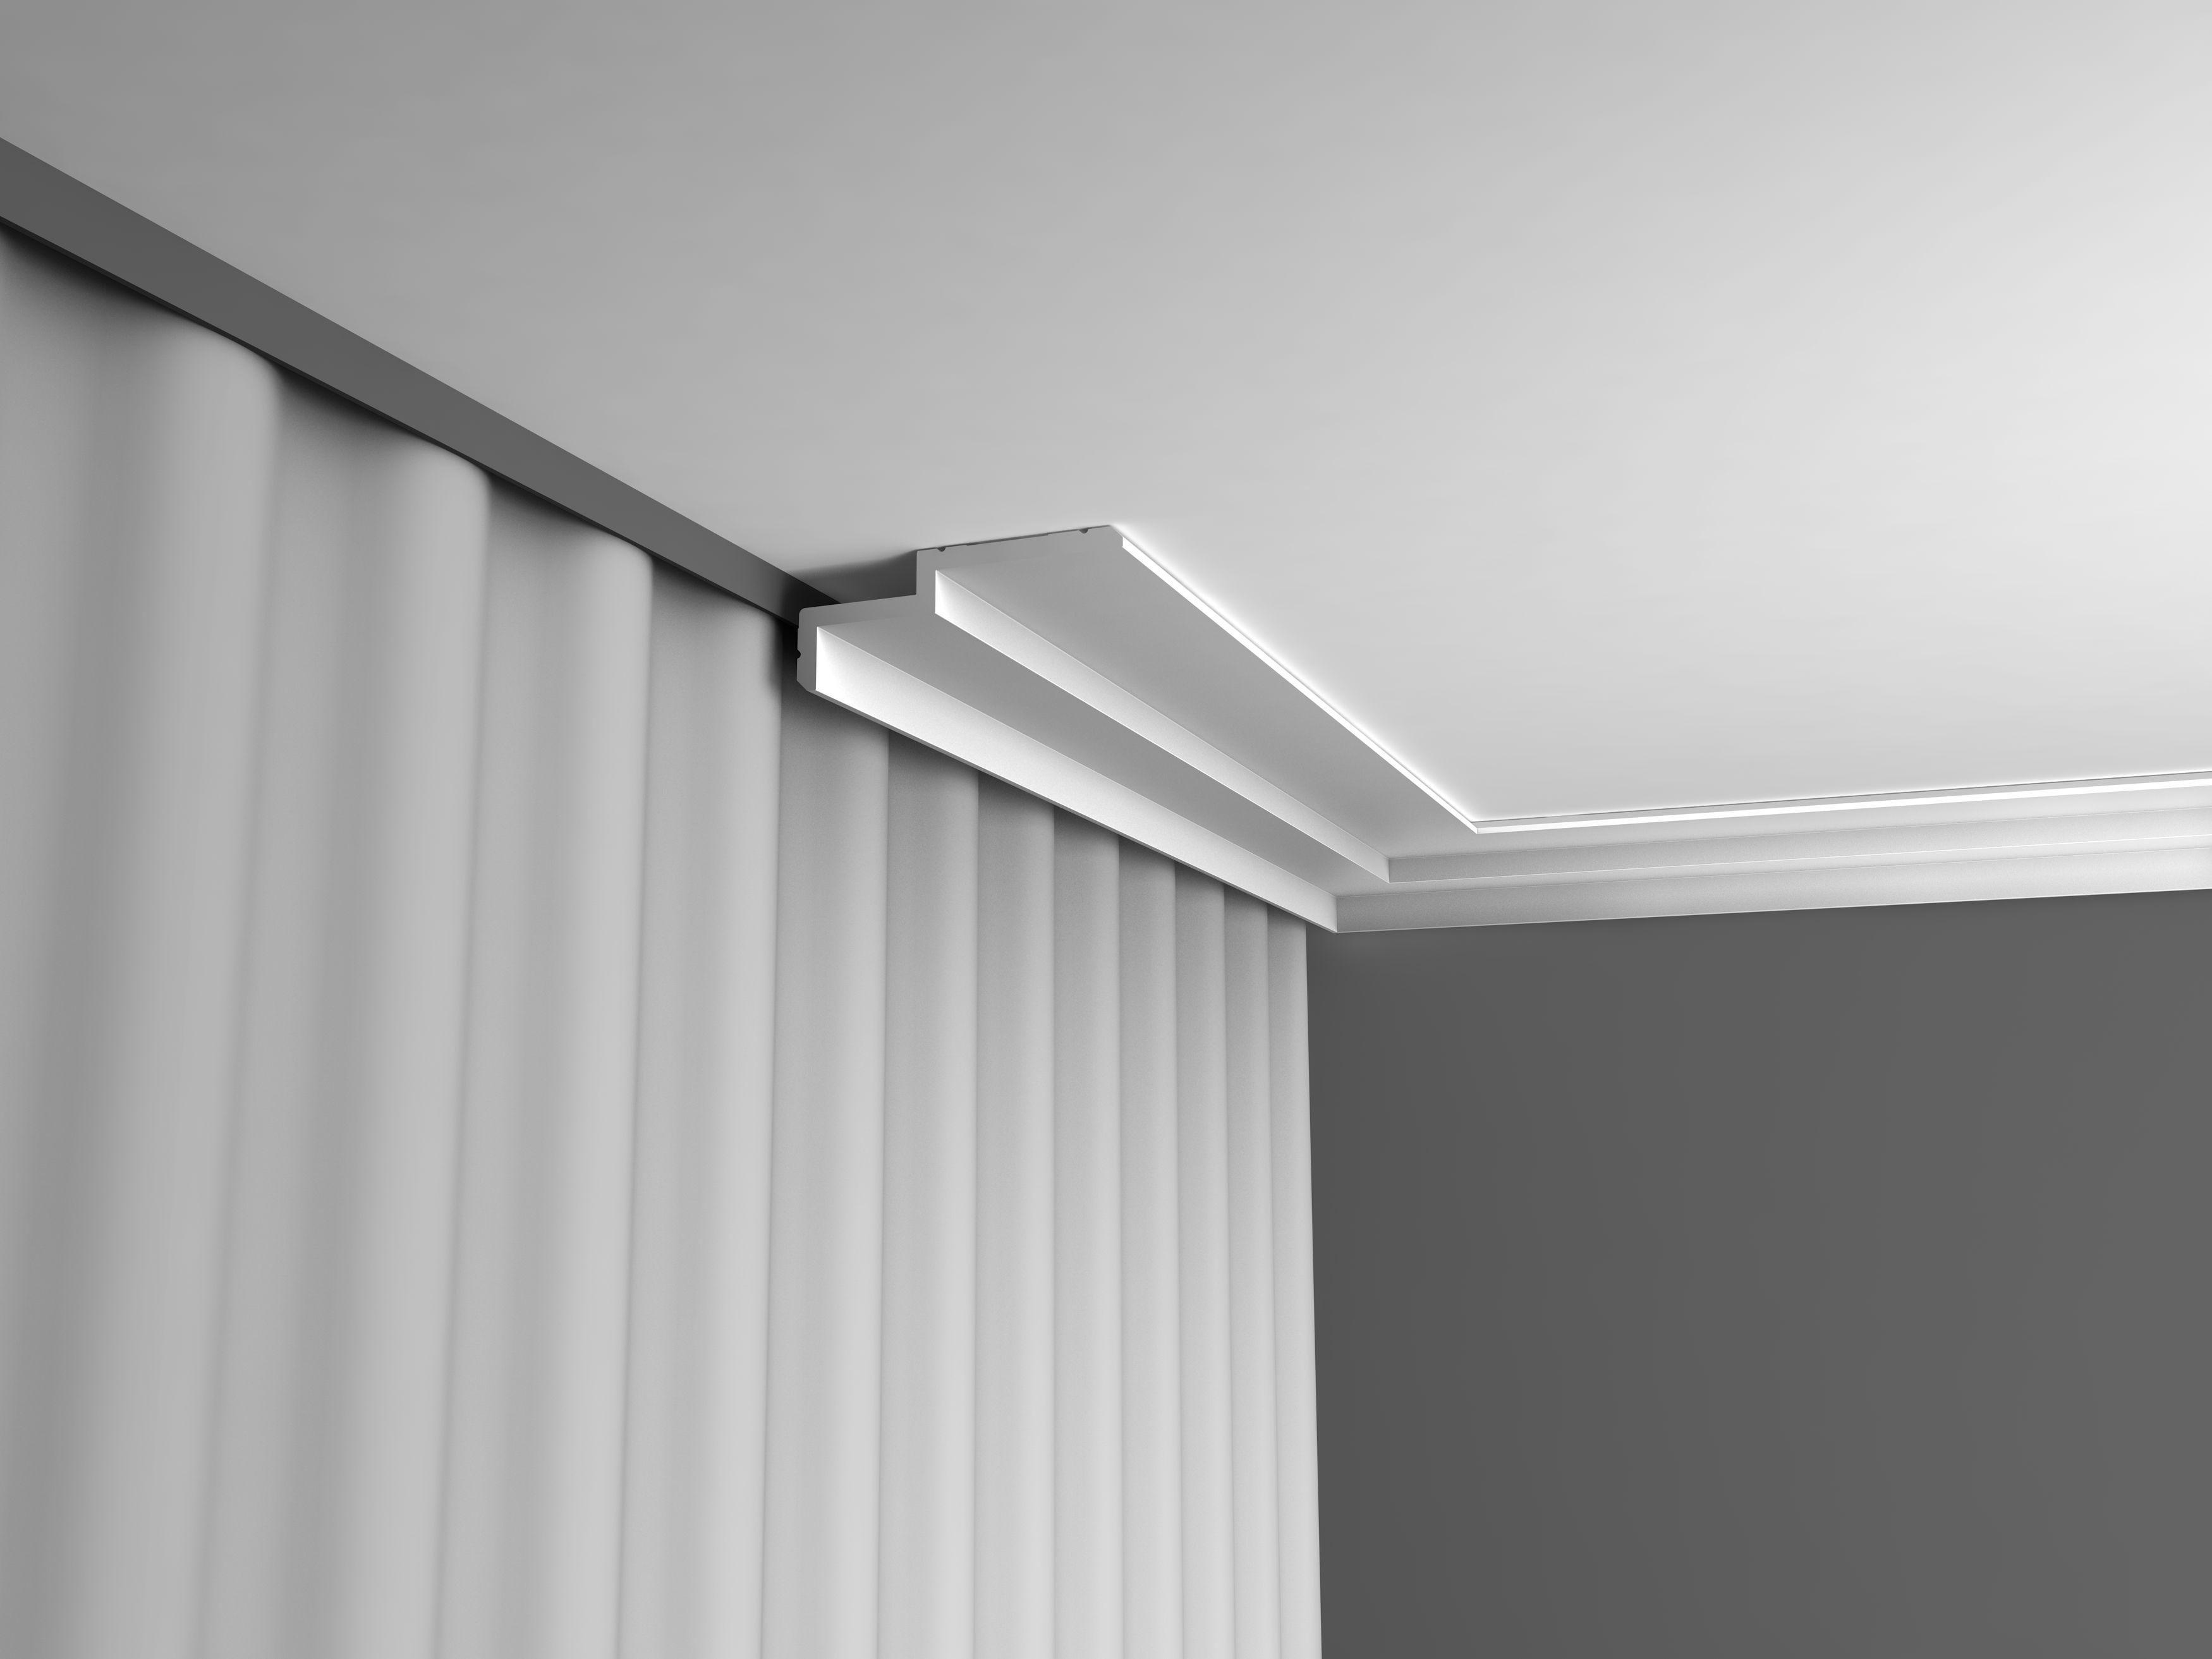 corniche plafond boite rideau c391 luxxus orac decor collection modern collection modern. Black Bedroom Furniture Sets. Home Design Ideas